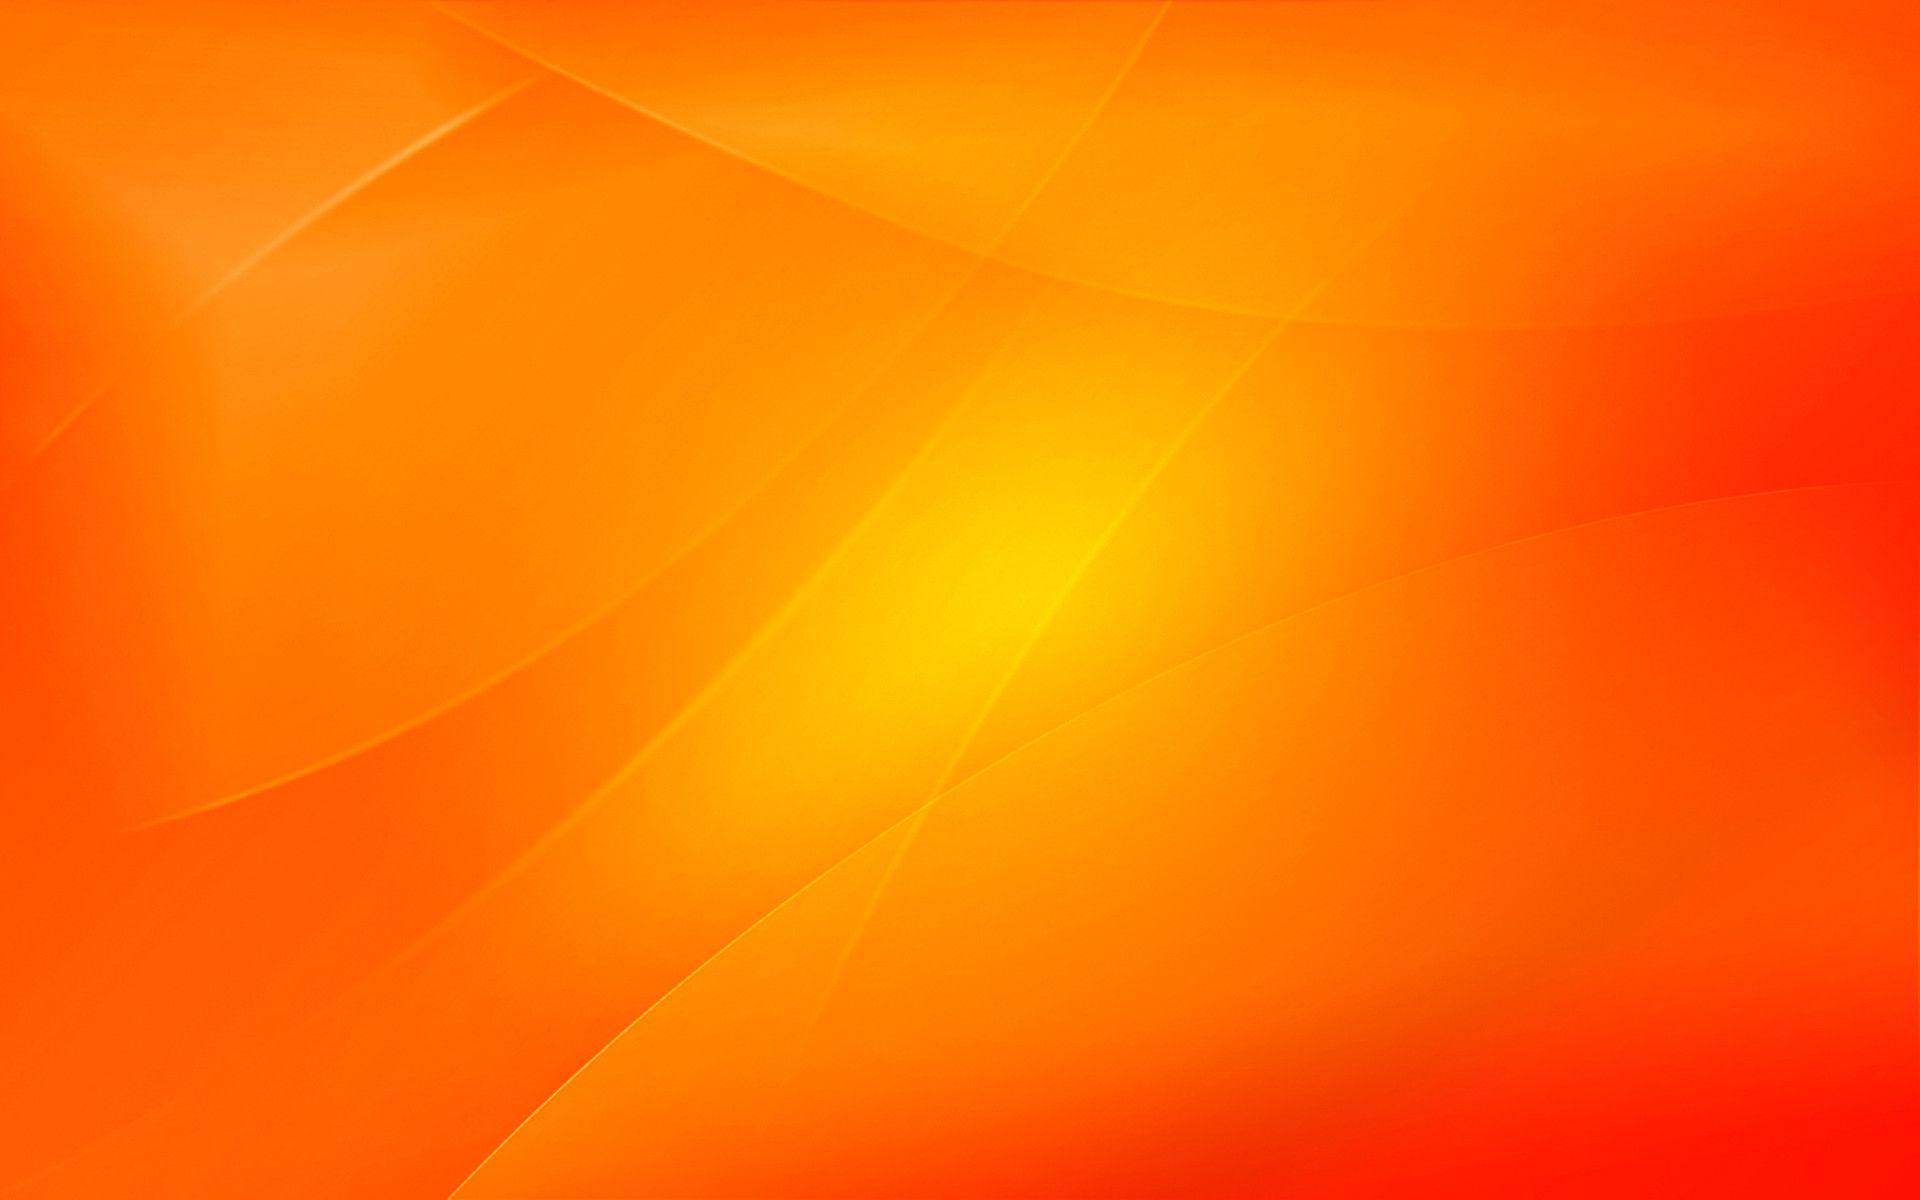 Cool Orange Backgrounds